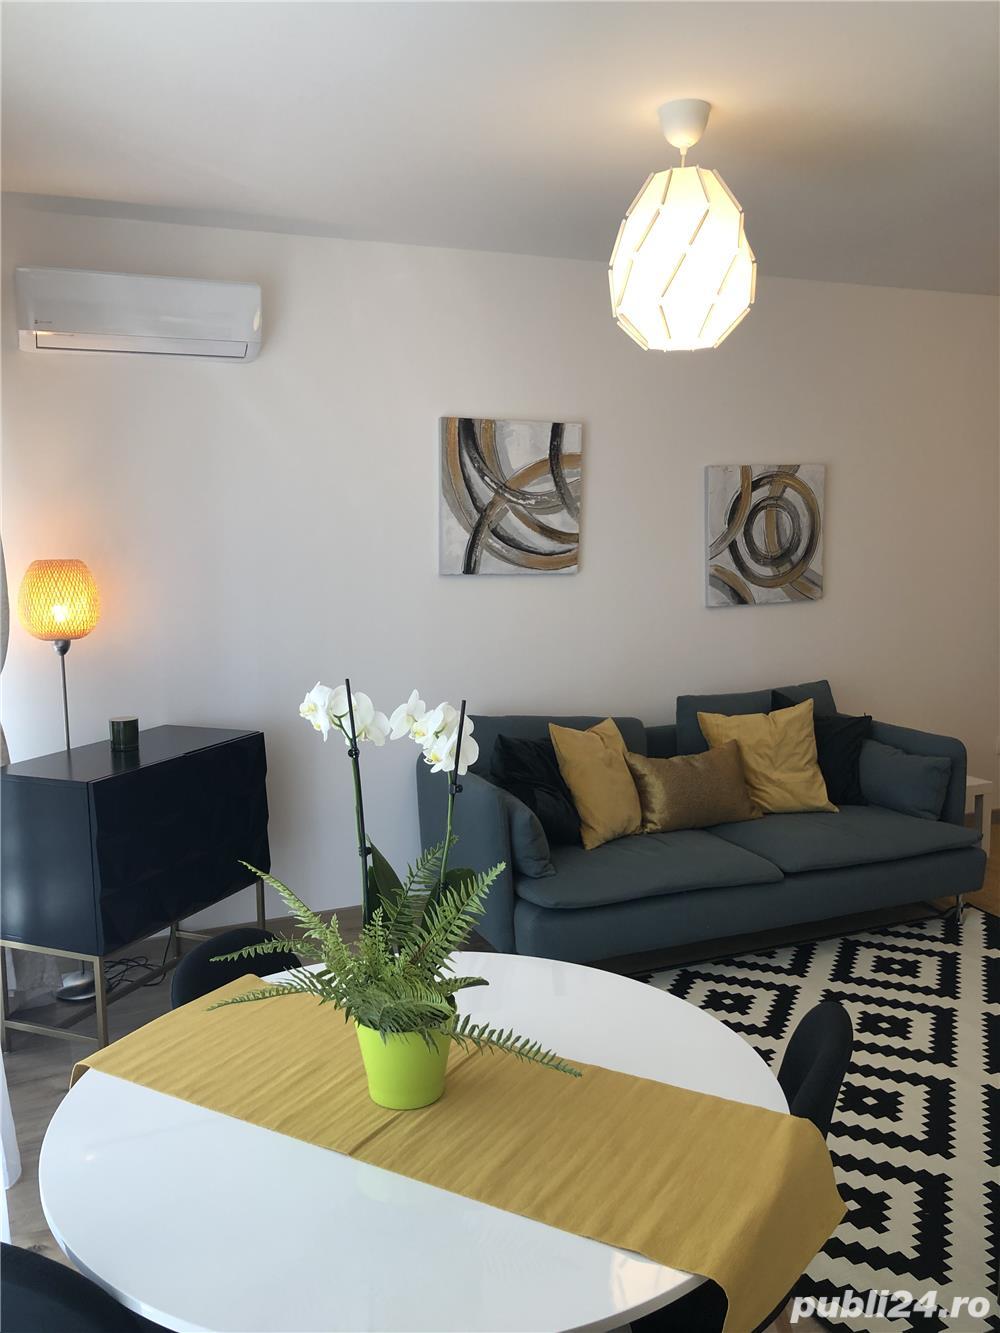 Aviatiei - Apartament 2 camere de inchiriat - Complex Belvedere